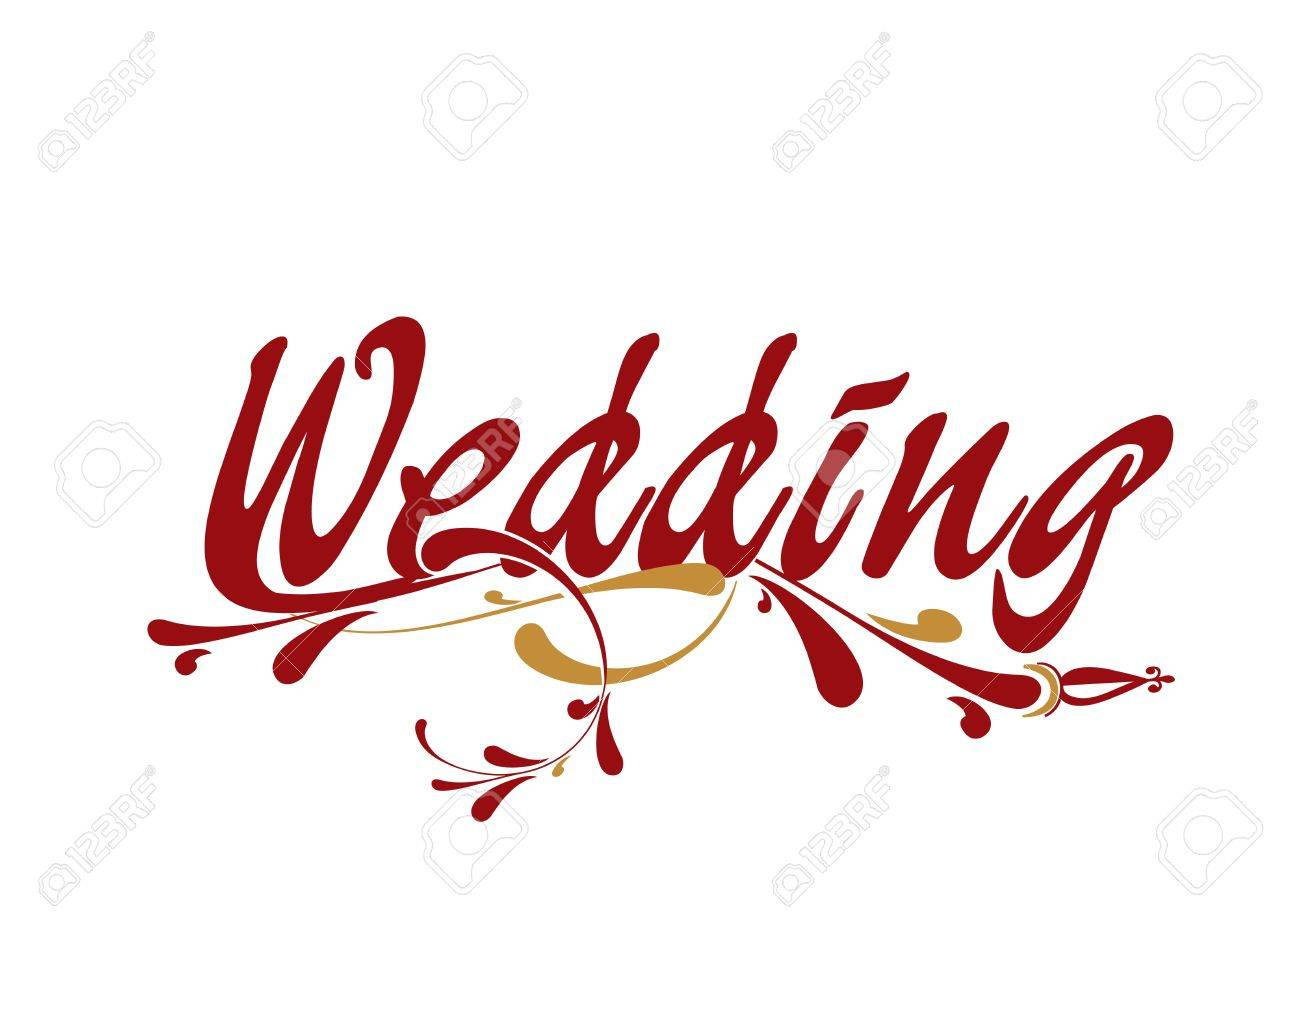 Wedding floral vector illustration design element. Stock Vector - 9279881